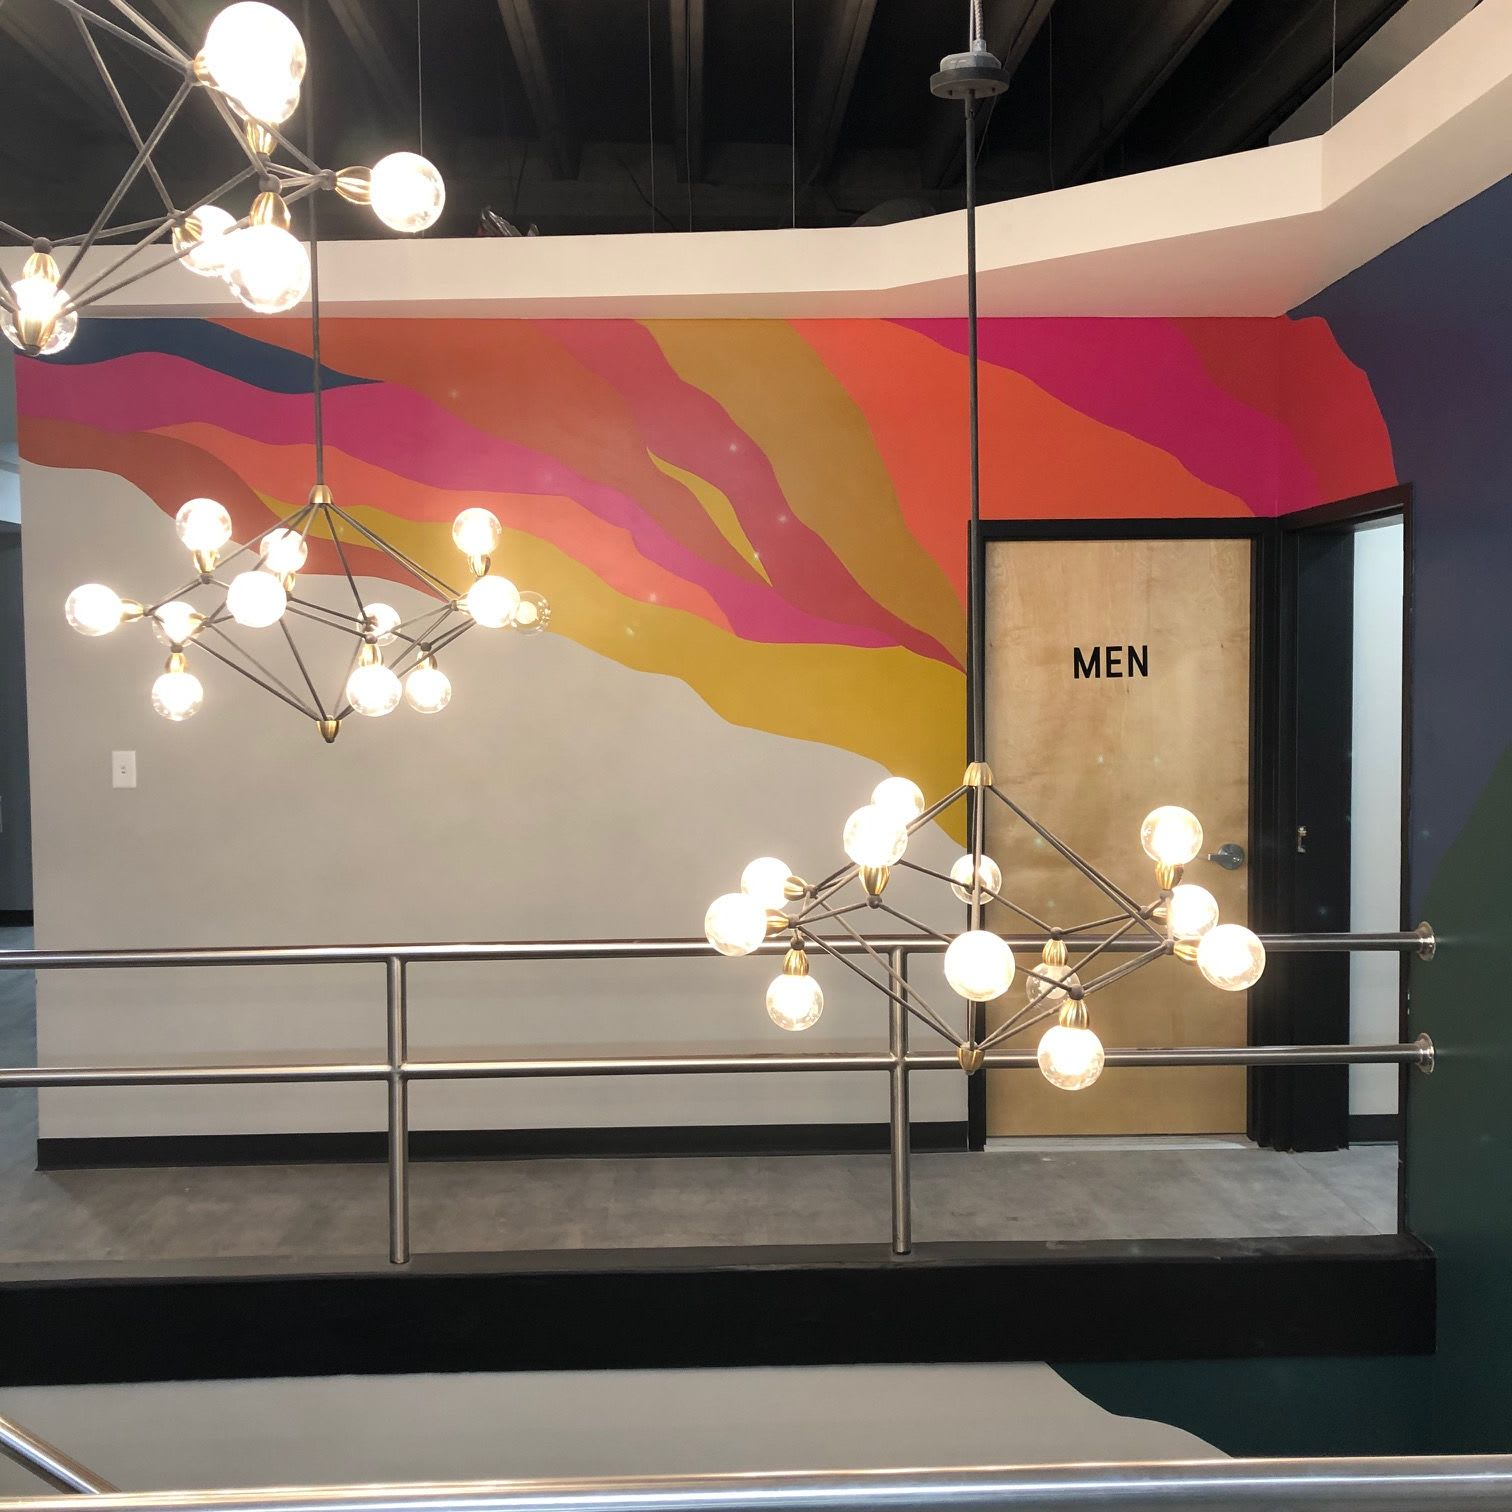 Interior Design by Josh Scheuerman seen at INDUSTRY SLC, Salt Lake City - 537 for INDUSTRY SLC